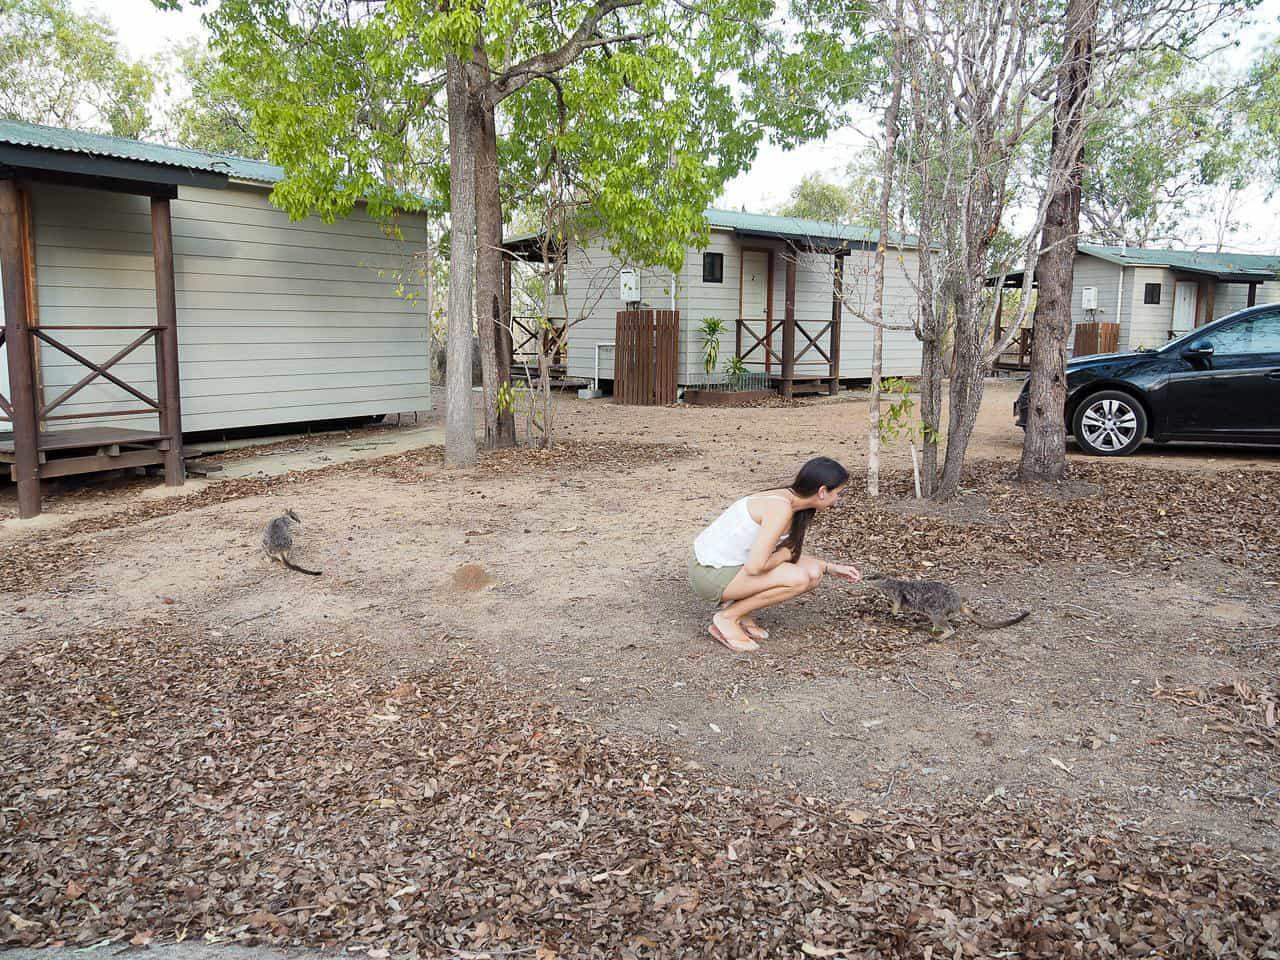 Granite-Gorge-Wallabies-Atherton-Tablelands-North-Queensland-Australia ] Travel Mermaid 146